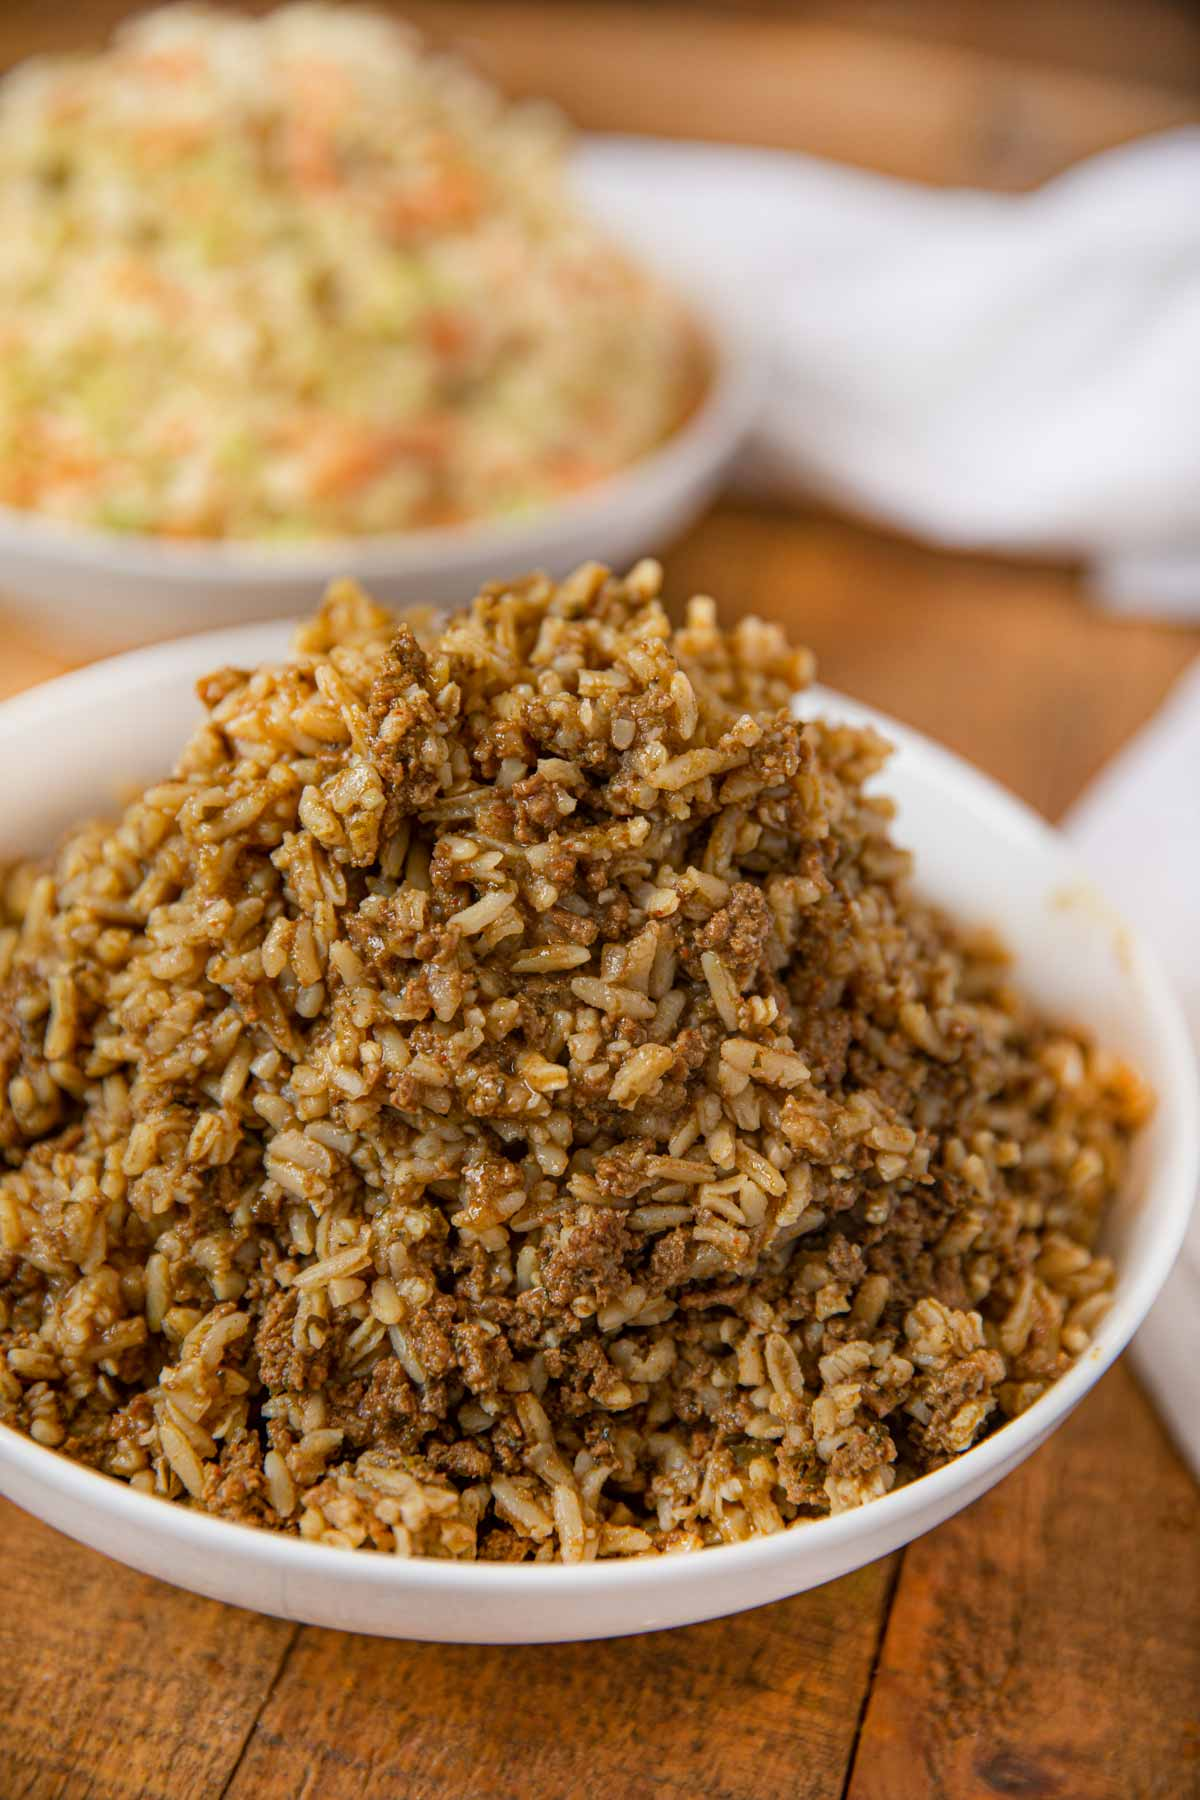 Popeye's Copycat Cajun Rice Recipe